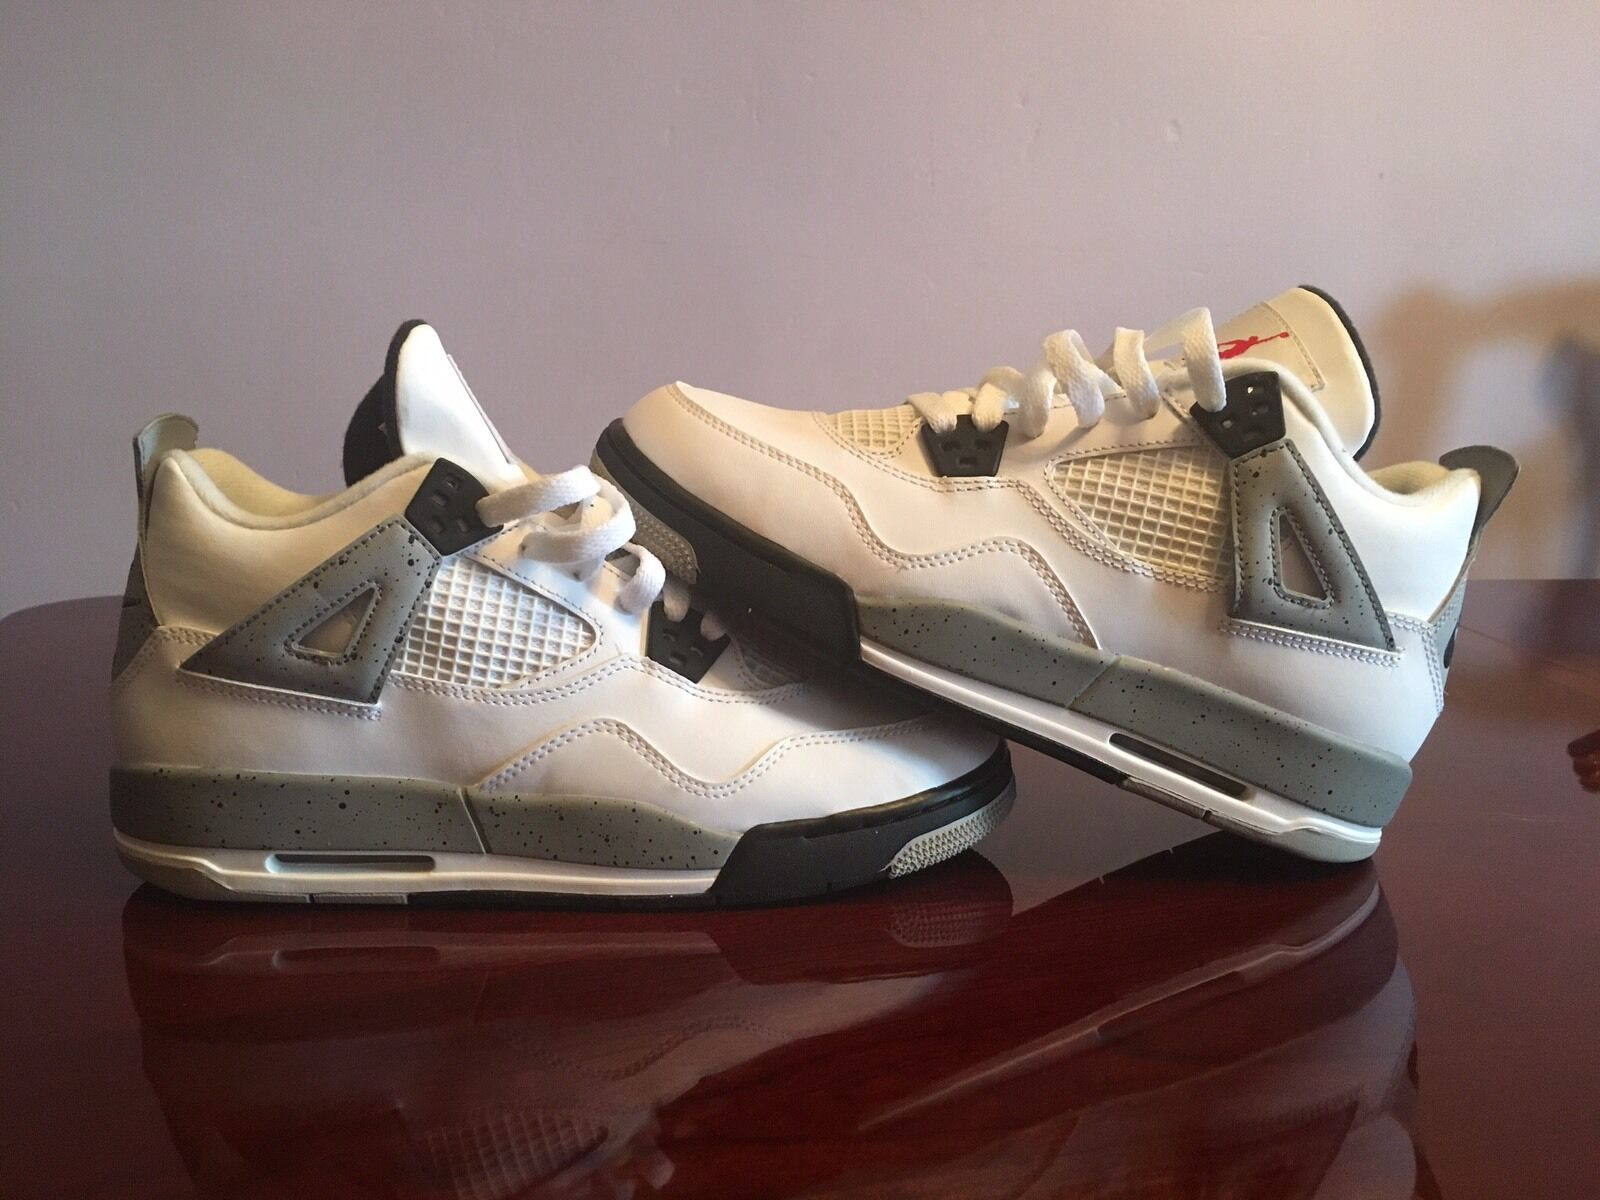 Jordan Retro 4 Cemento blancoo Air